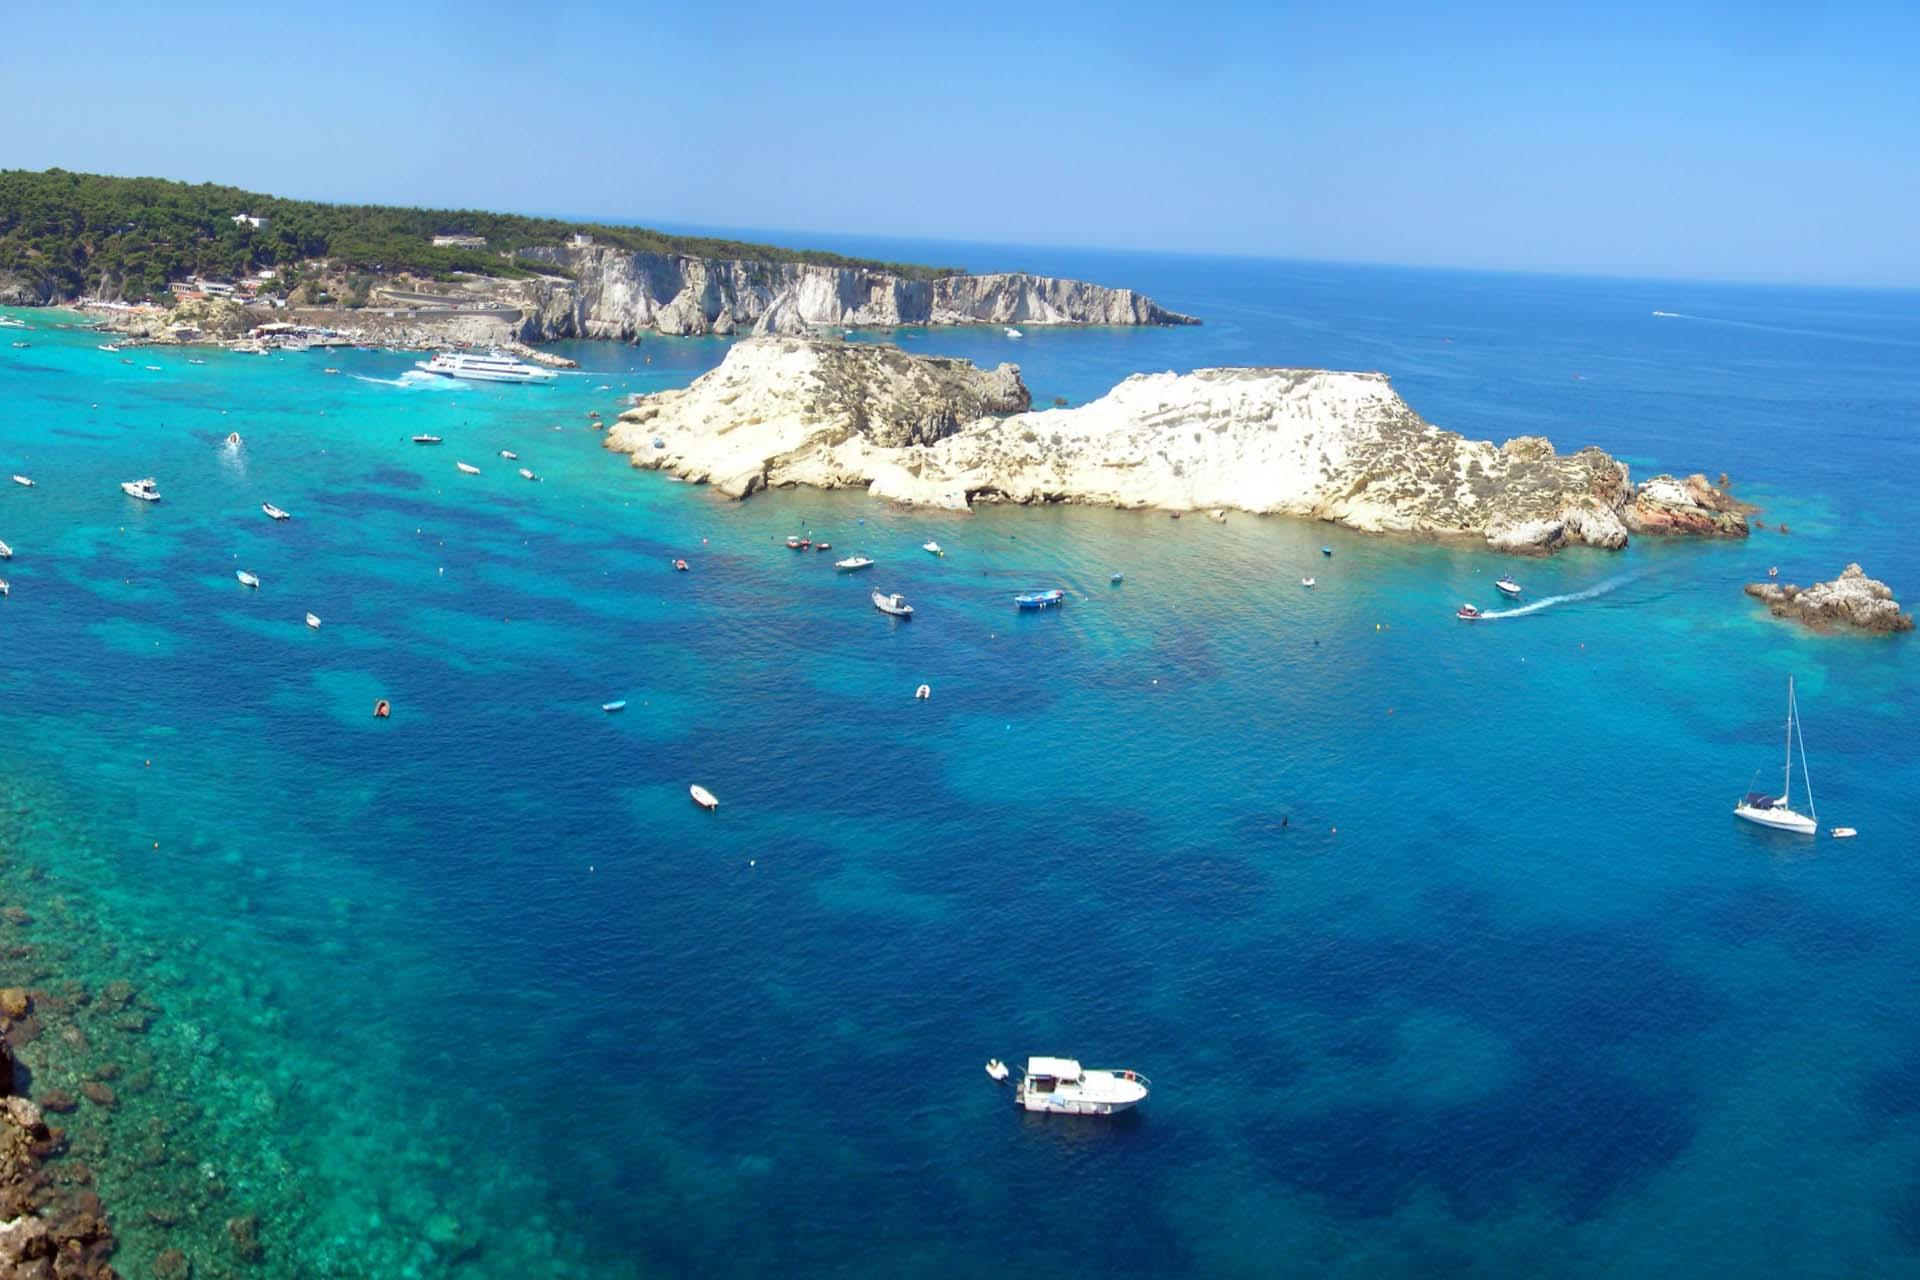 Spiaggia di Marina di Ginosa